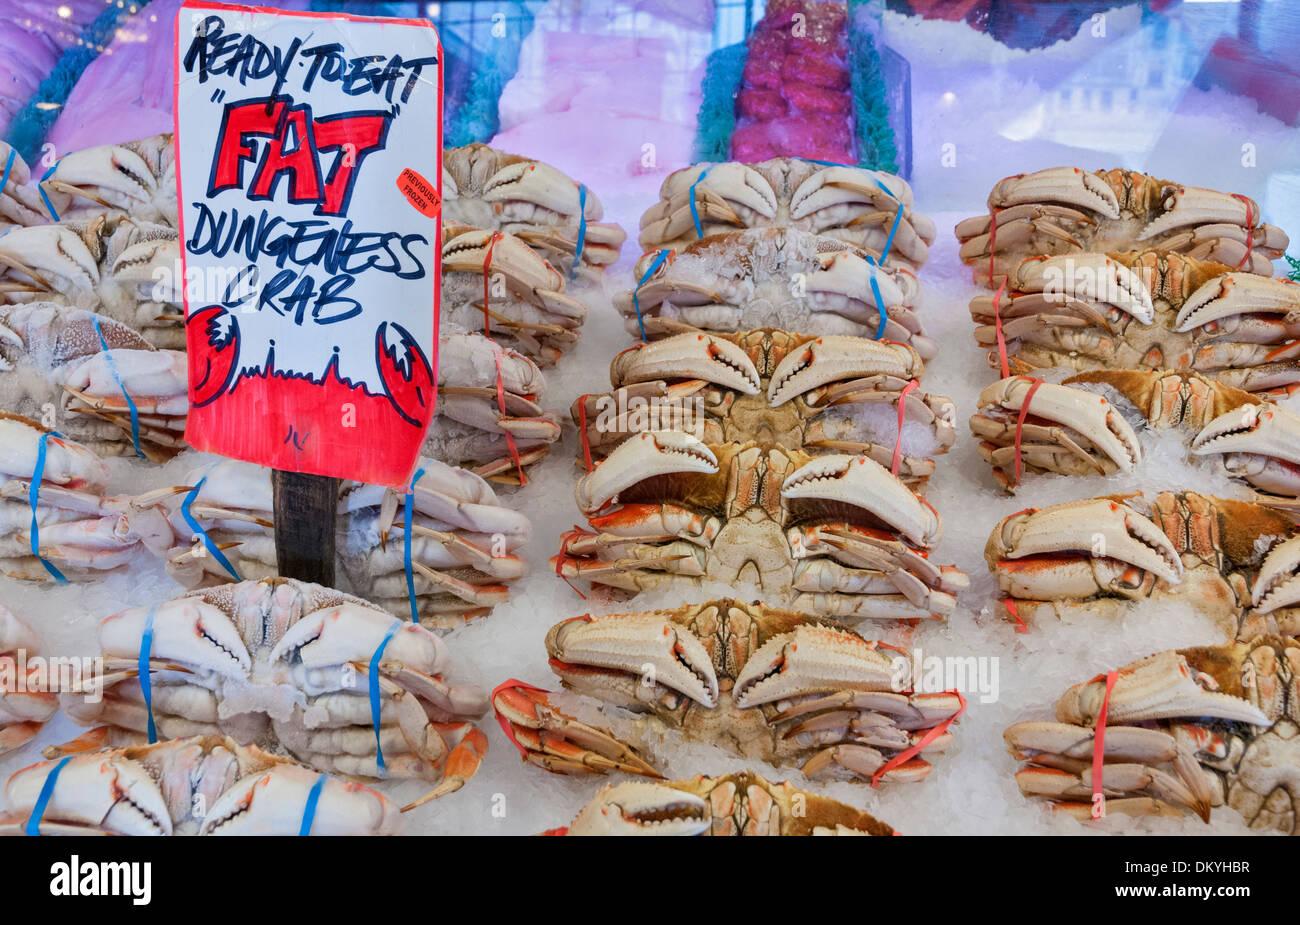 Seafood Near Pier 39